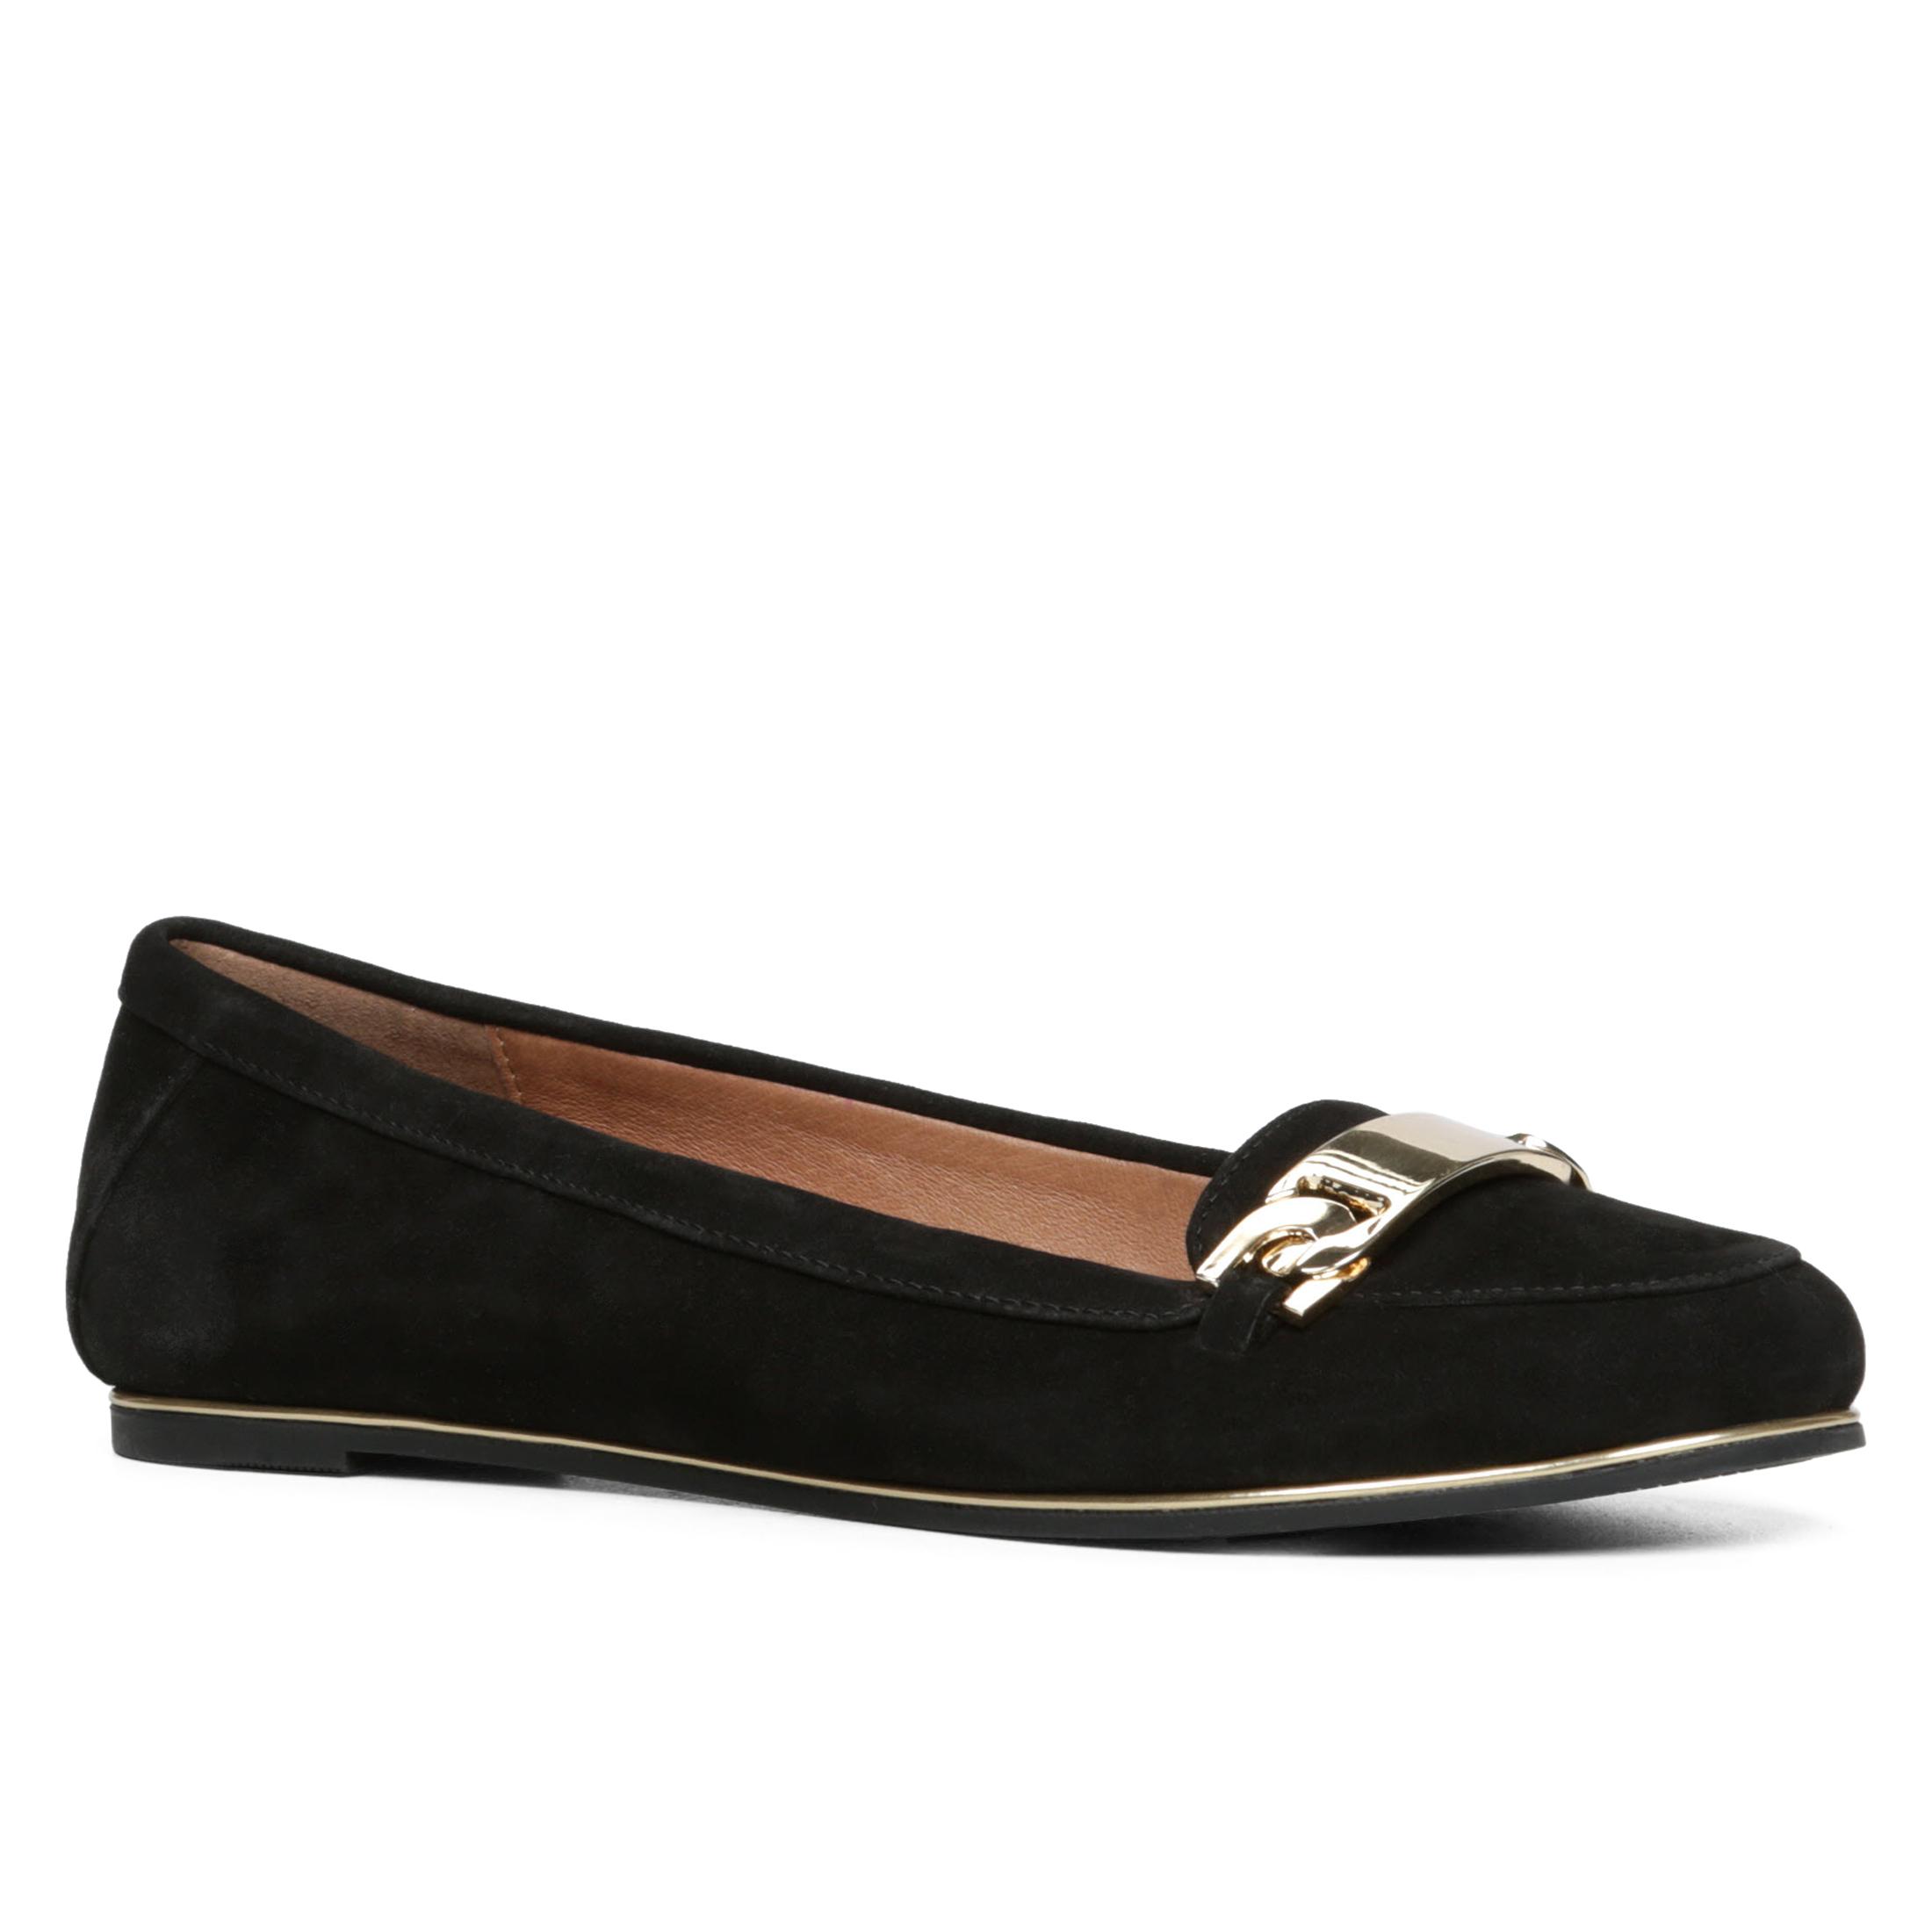 Aldo Shoes New Jersey